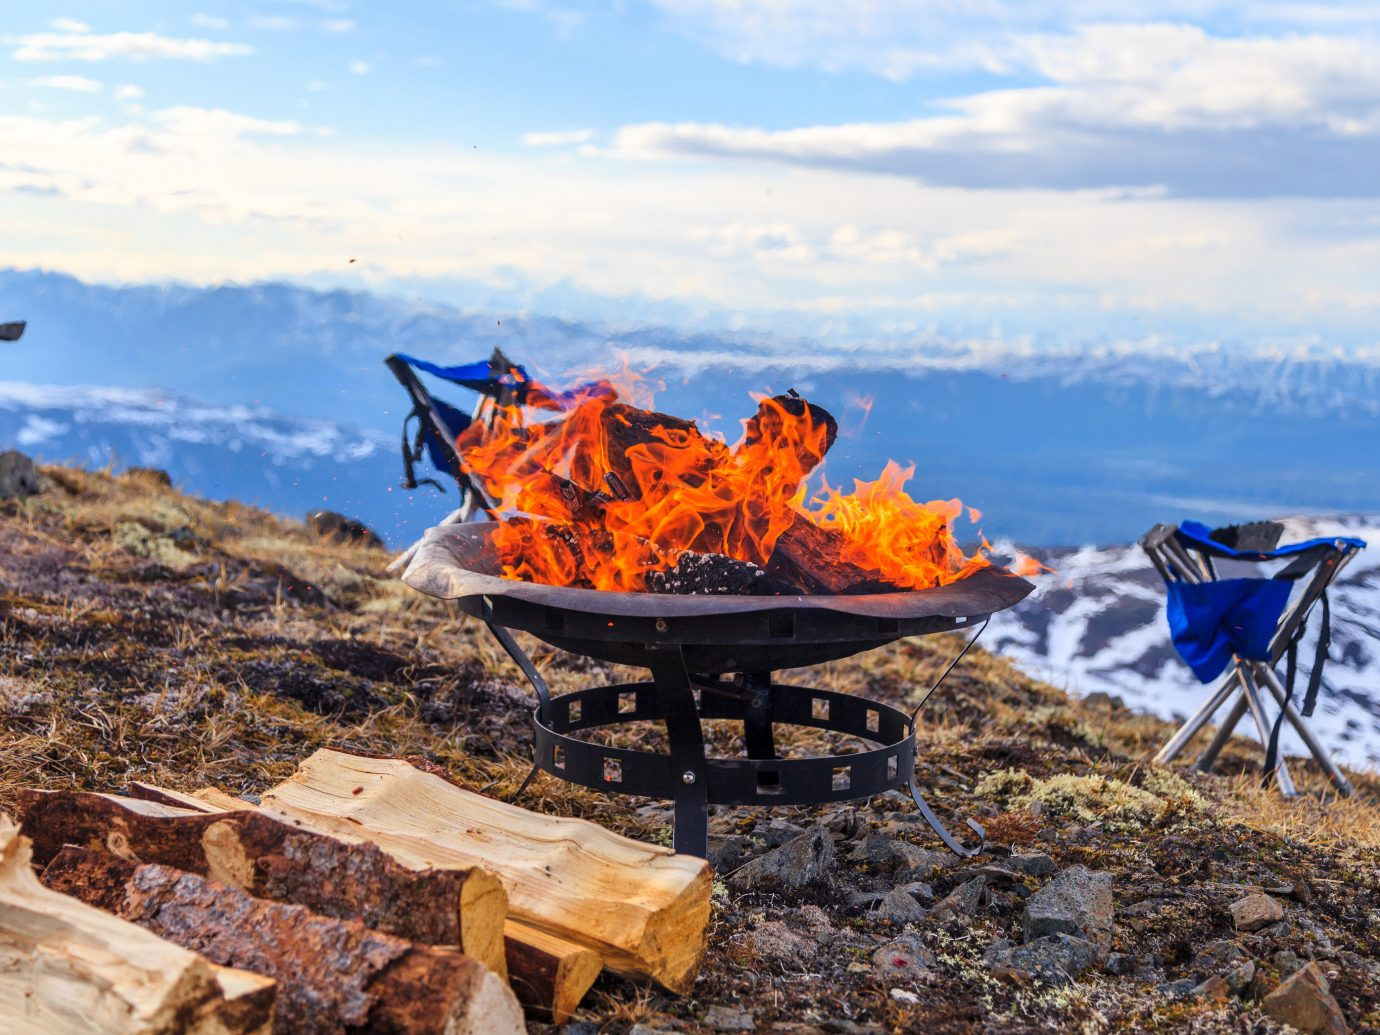 Hotels sky outdoor wilderness mountain geological phenomenon season Winter seat vehicle landscape chair mountain range Sea snow geology autumn mountaineering